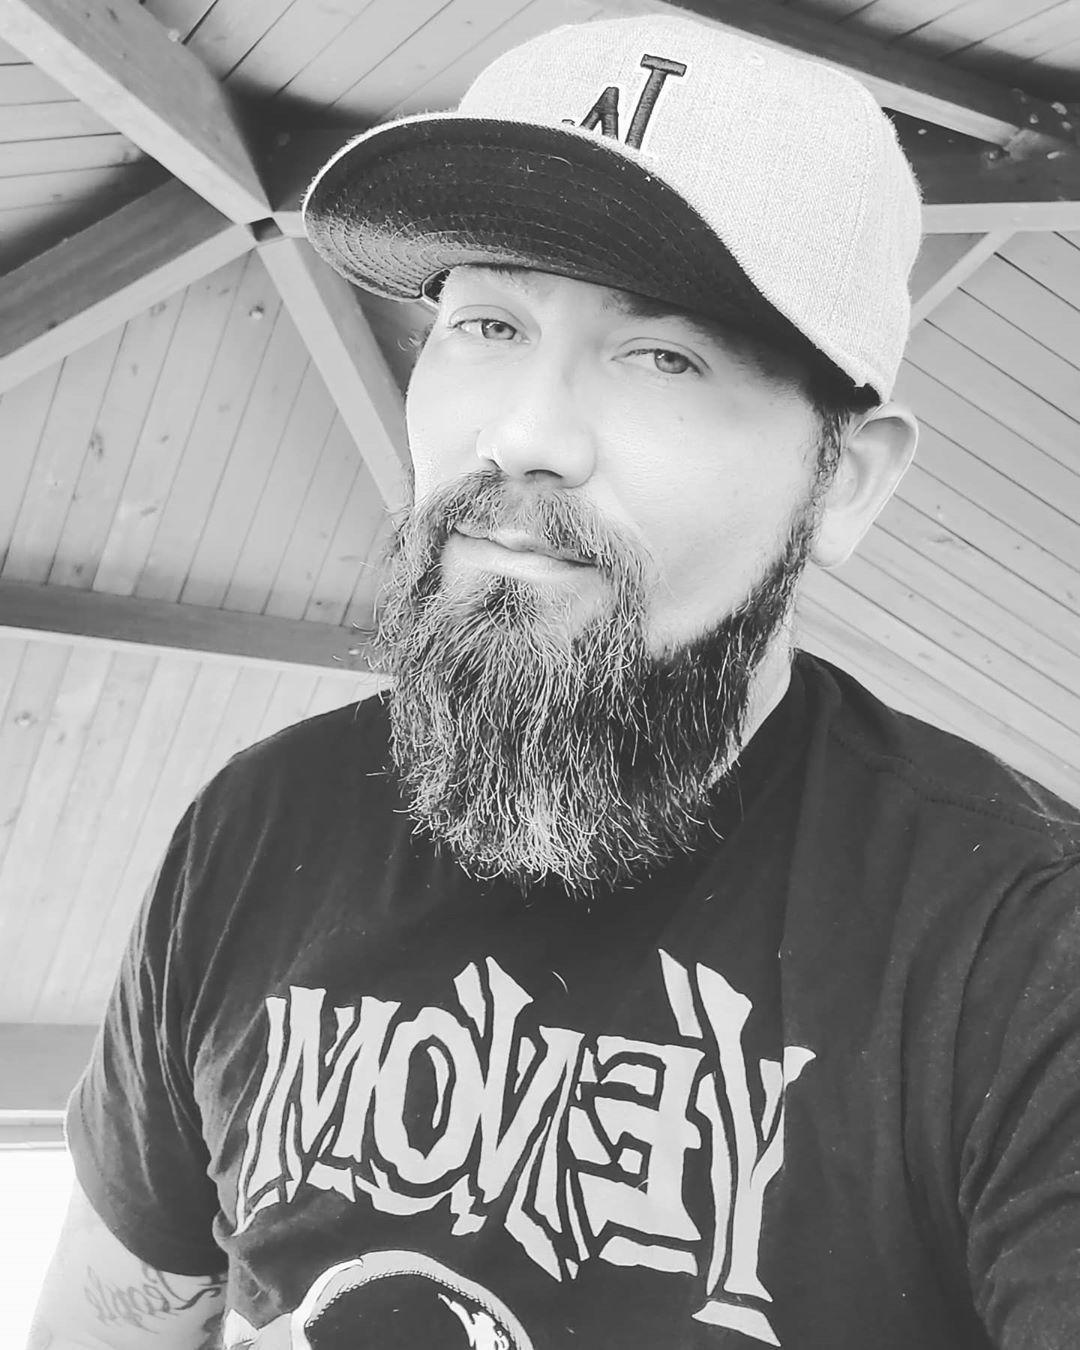 What a beautiful waether in fl....it nice have day off from work. But a crazy world now BE SAFE AND STAY HEALTHY.  #venom #vikingwarrior #vikings #vikingstyle #bigbang #beardstyles #beardnation #beard #beardlife #beardedman #deaf #deafandproud #tattoostyle #tattoomodel #tattooworld #tattooed #florida #badass #badboy #hat #hardknocklife #lifeisgood #rustystyle